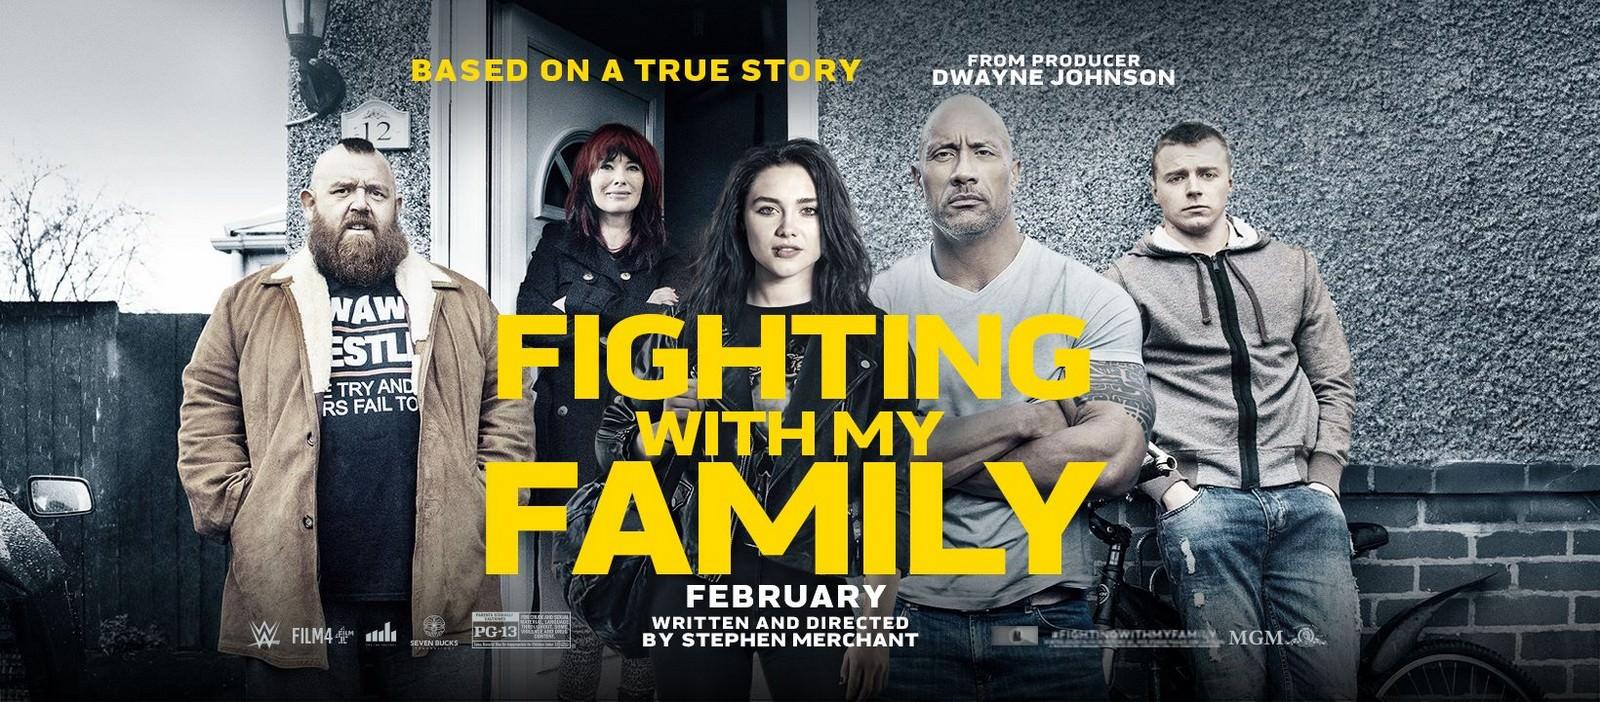 Movie, 我和我的摔角家庭 / Fighting with My Family(英國, 2019年) / 为家而战(網路), 電影海報, 英國, 橫版